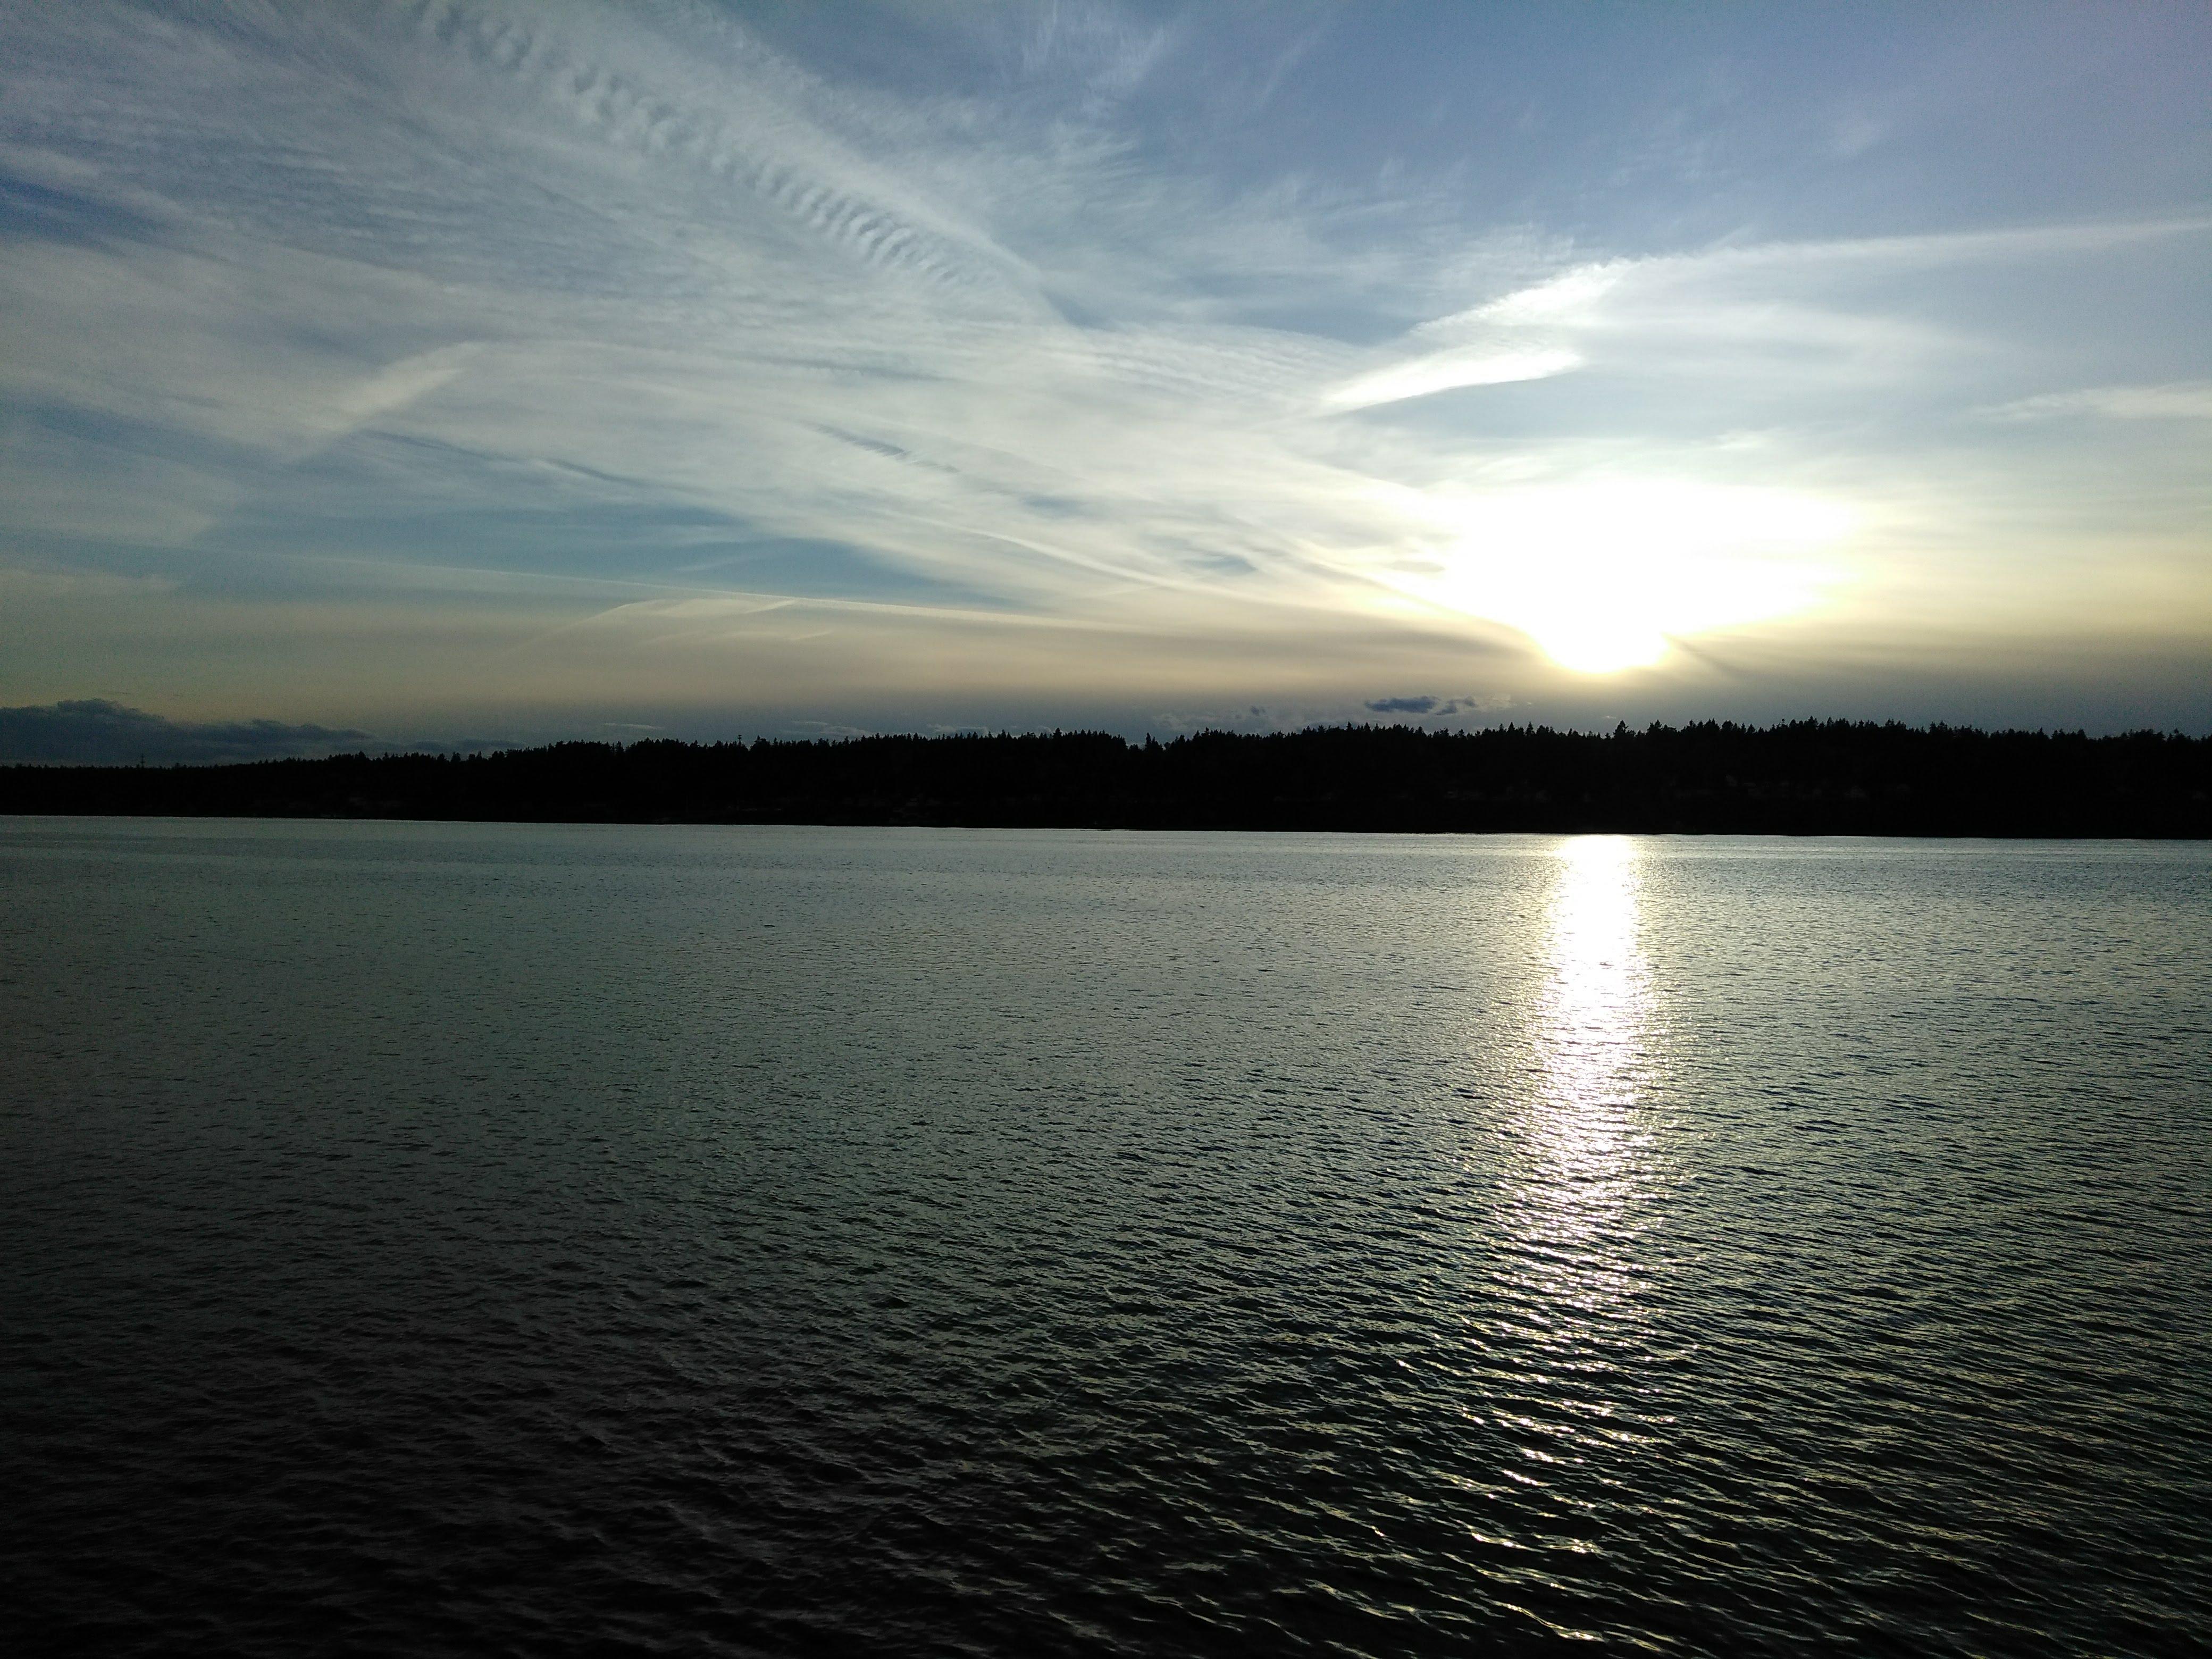 Sunset in Port Madison